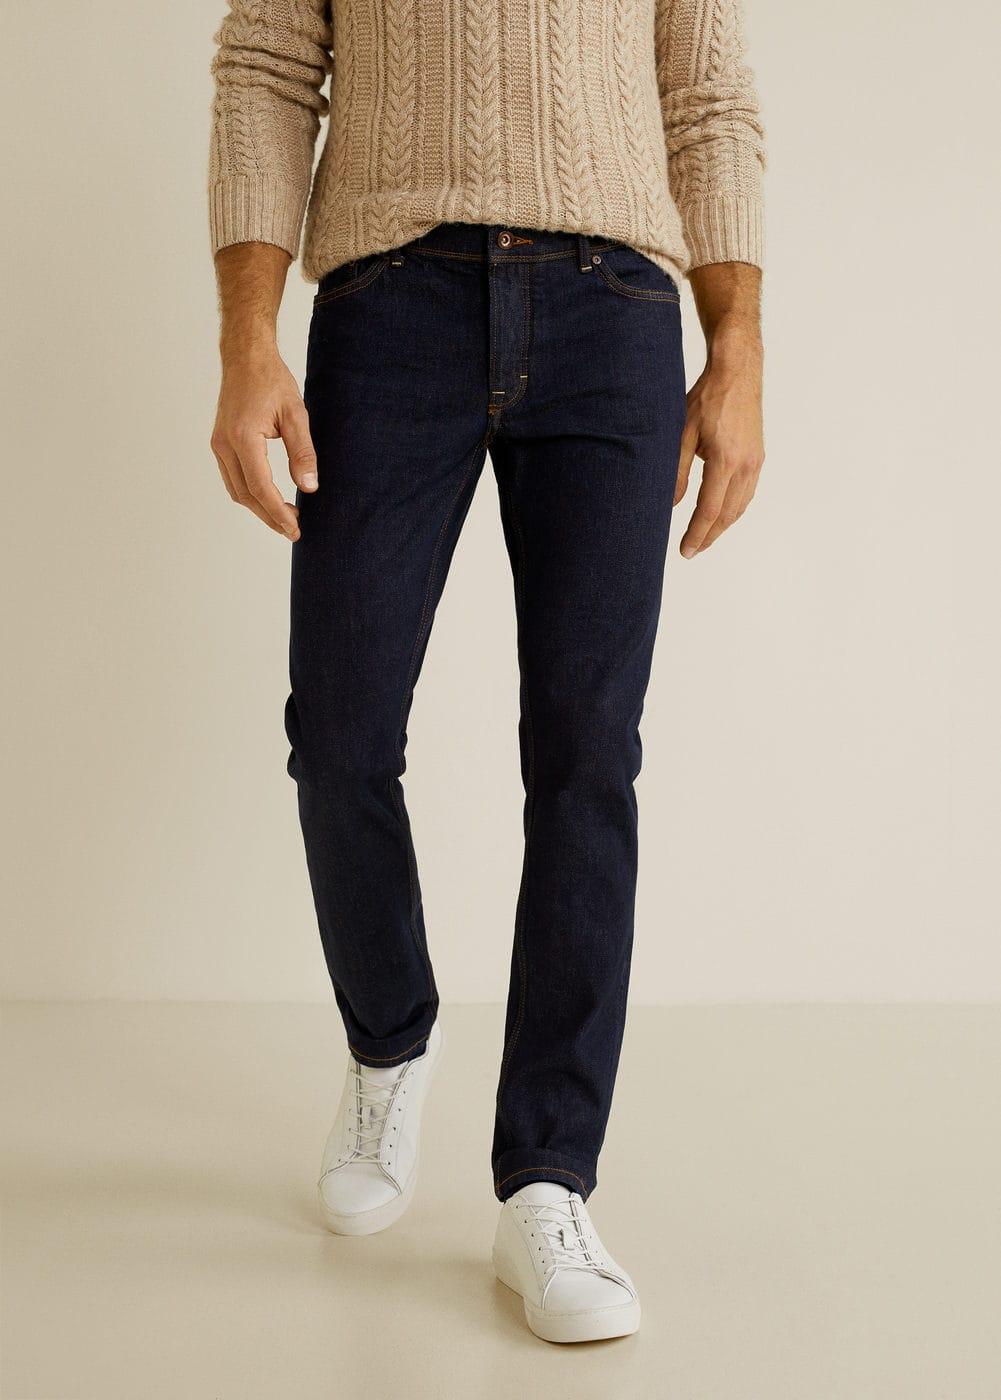 Mango - Jeans Tim slim-fit lavado oscuro - 1